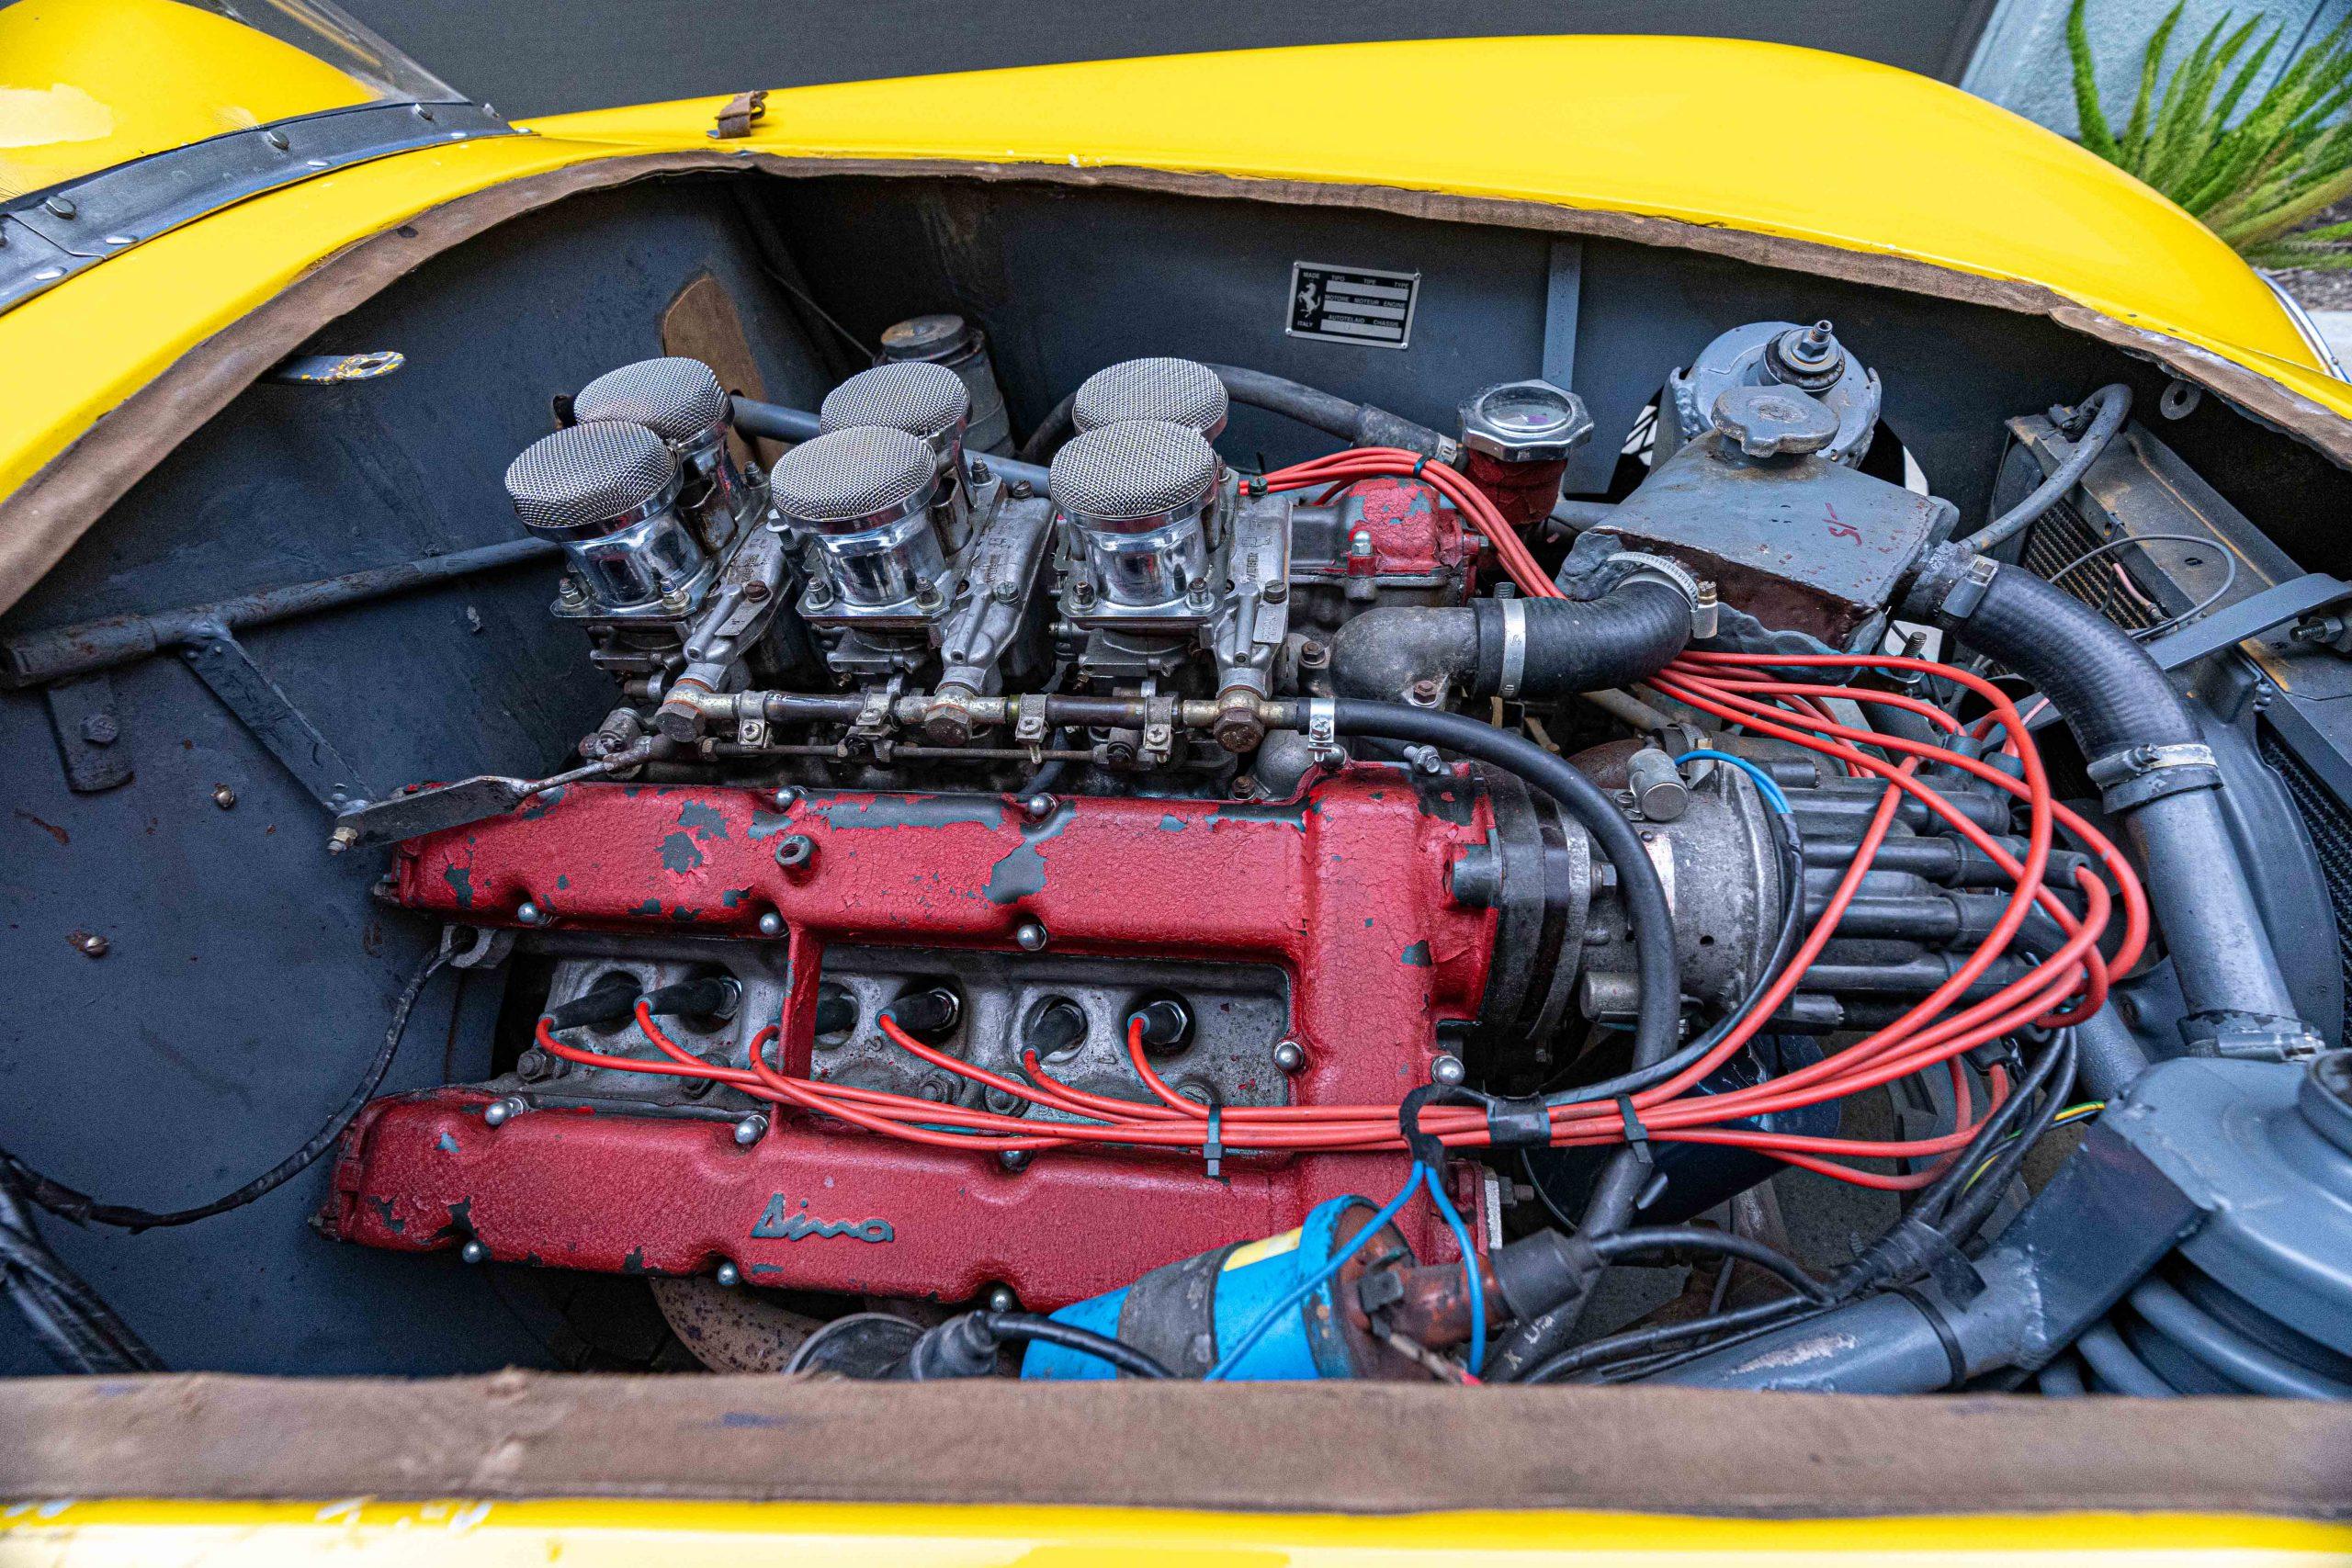 1957 Ferrari 196 SP Engine passenger side view